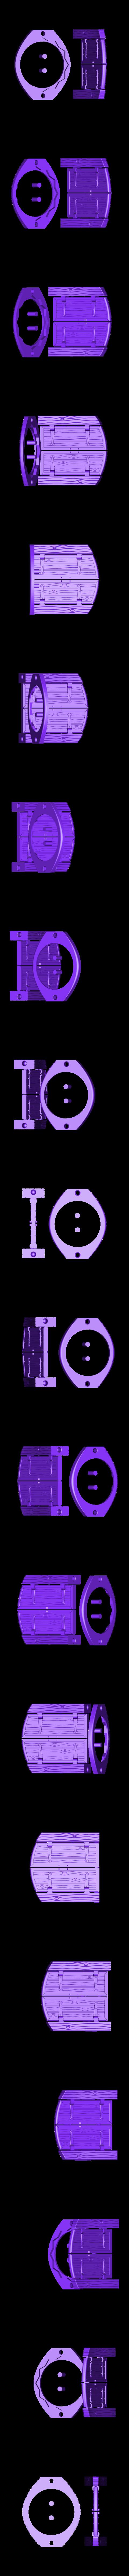 Wood_Door_-_Working_No_Arch.stl Download free STL file Wood Dungeon Door - Hinged, Open/Closed, & Slide In • 3D printing model, RobagoN